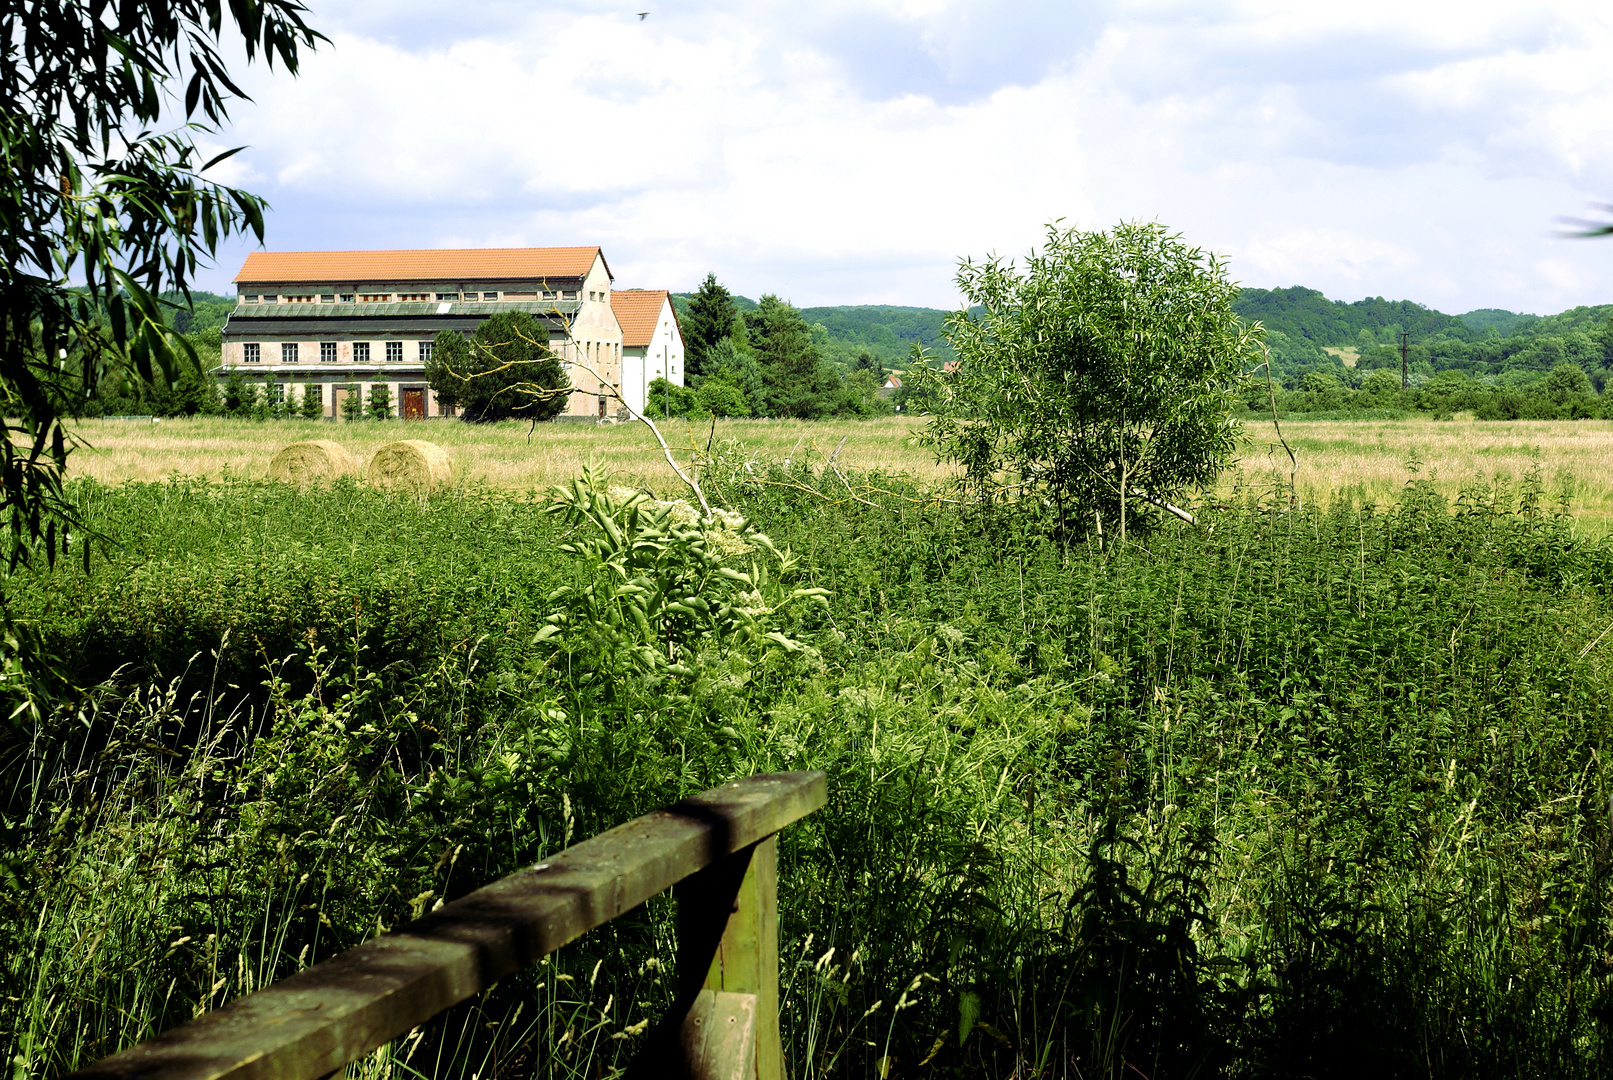 Am Salzaquell - Nordhausen